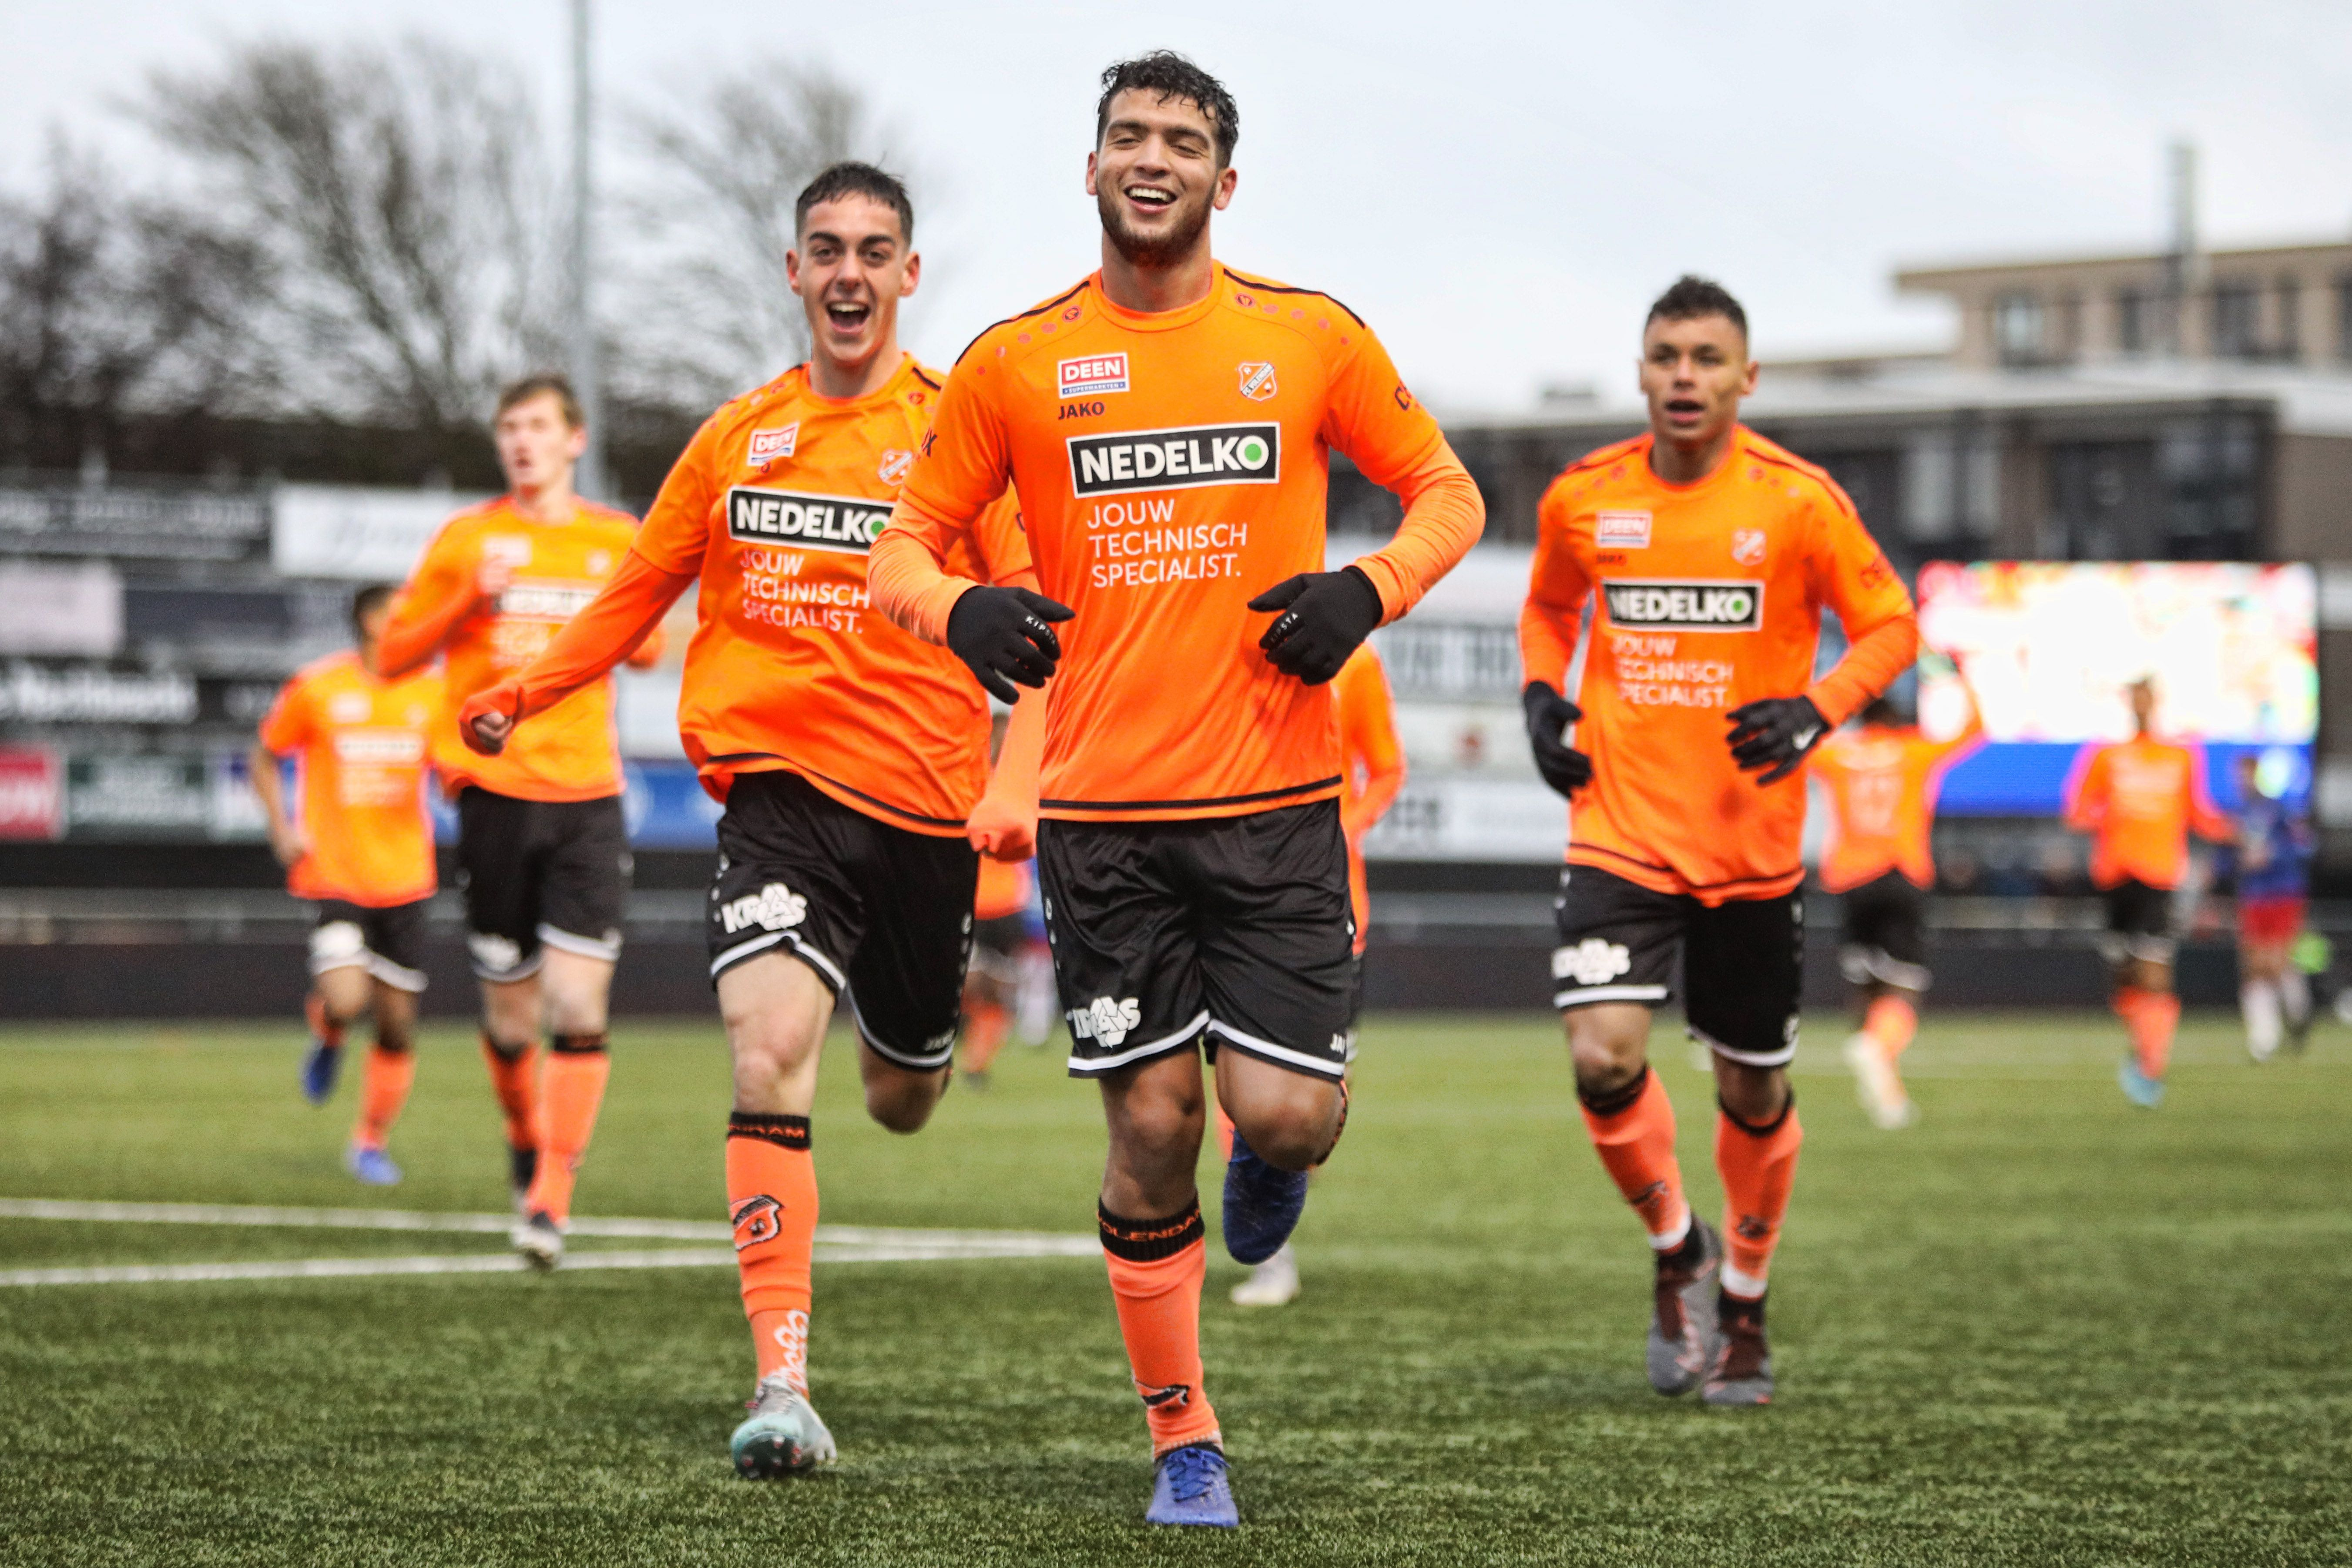 Pak slaag voor Jong FC Volendam na dramatisch kwartier